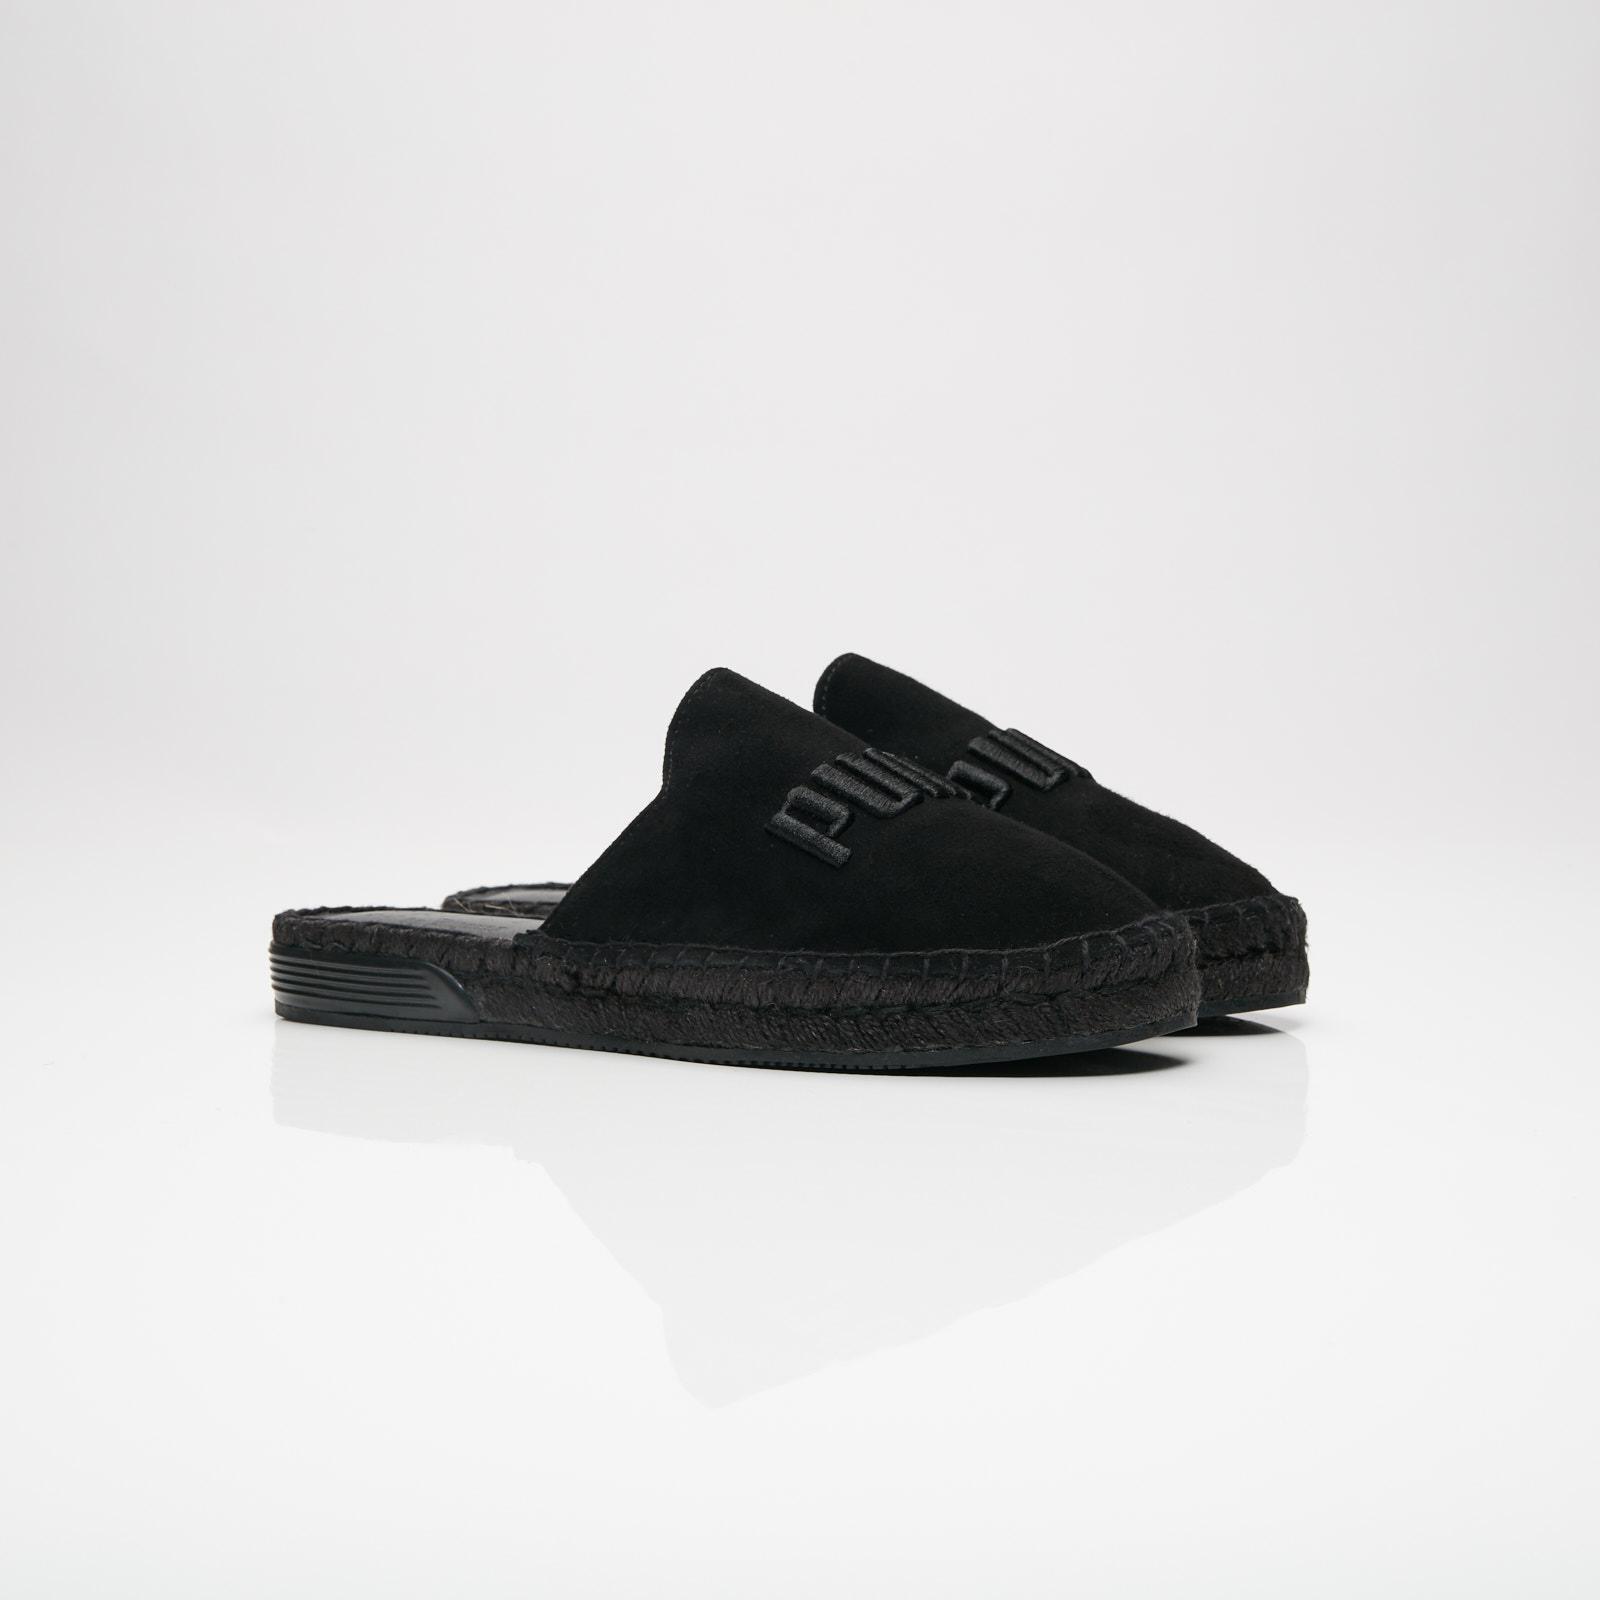 buy popular 864a8 88cd4 Puma Fenty Espadrille Wmns - 367685-01 - Sneakersnstuff ...